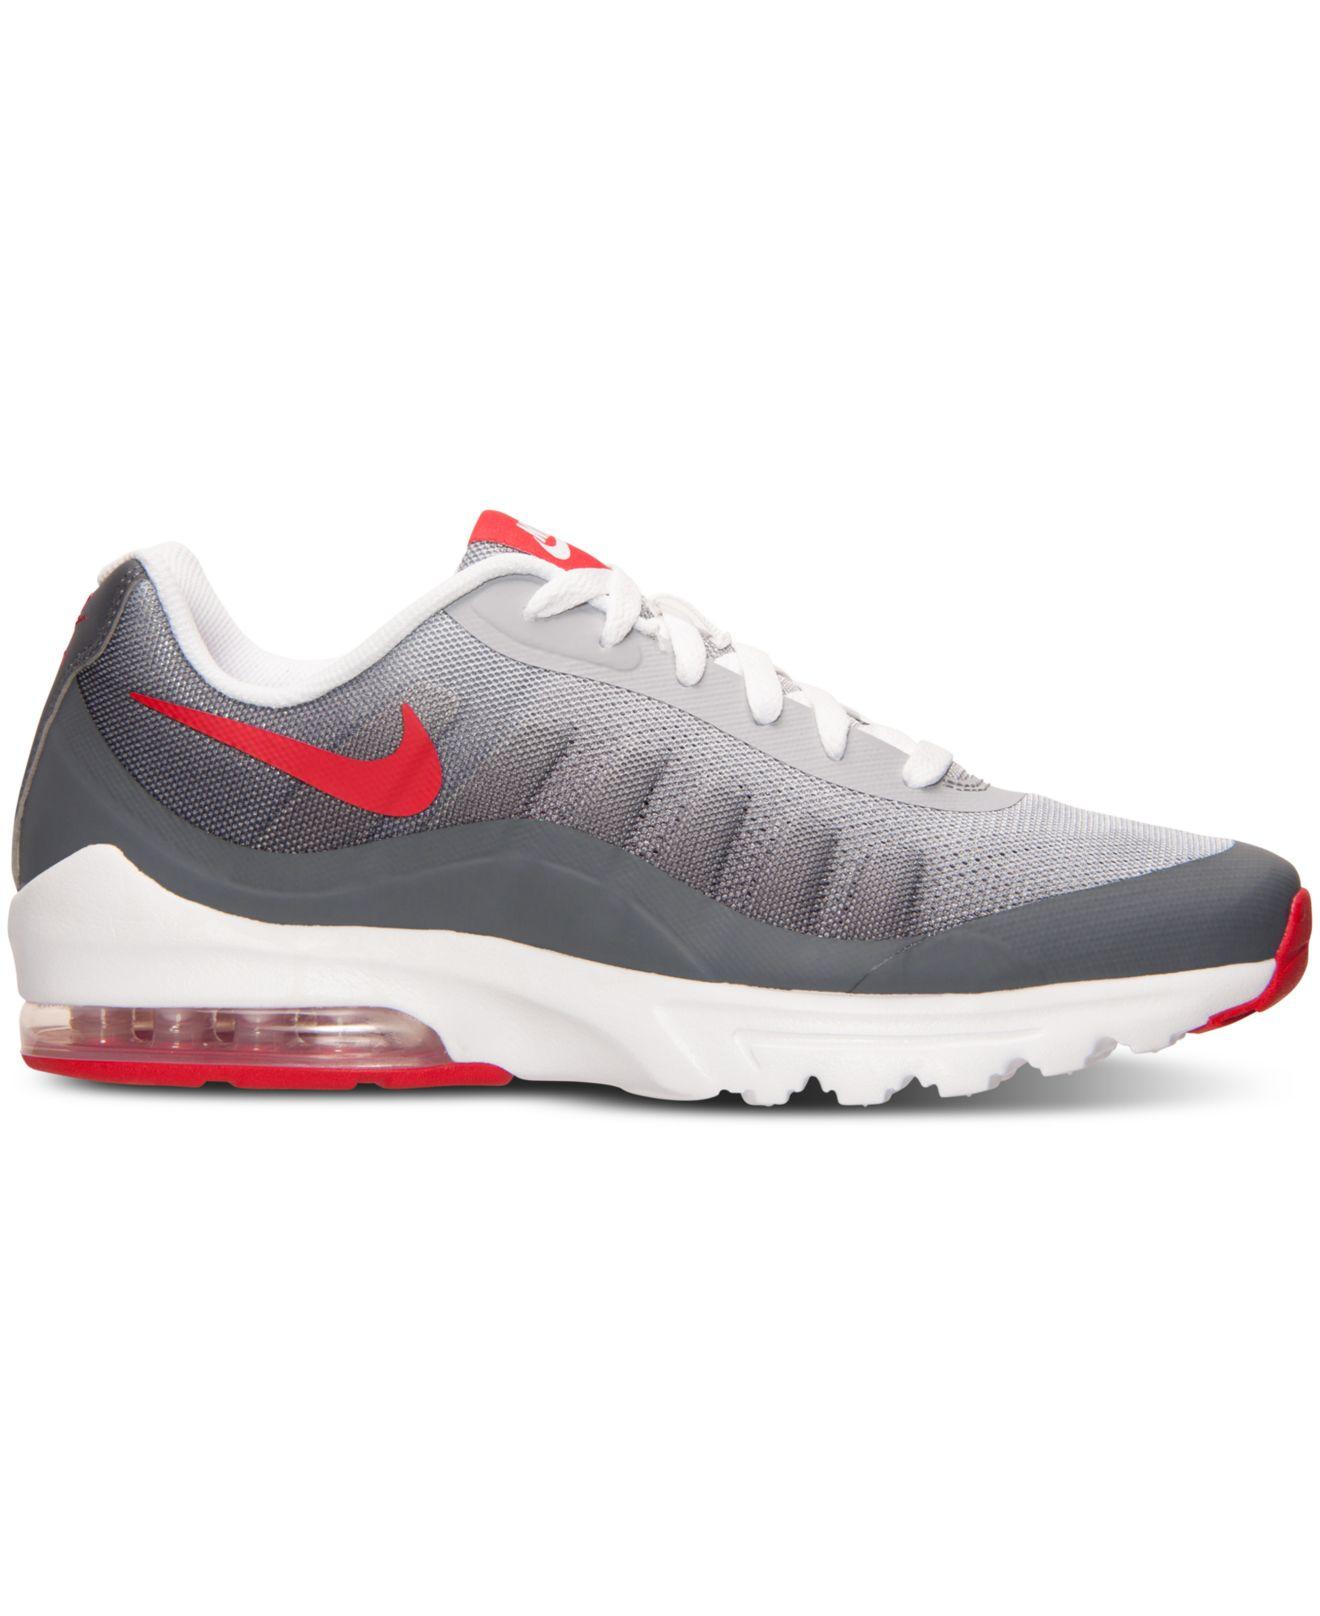 d75d5cd69d Lyst - Nike Men s Air Max Invigor Print Running Sneakers From Finish ...